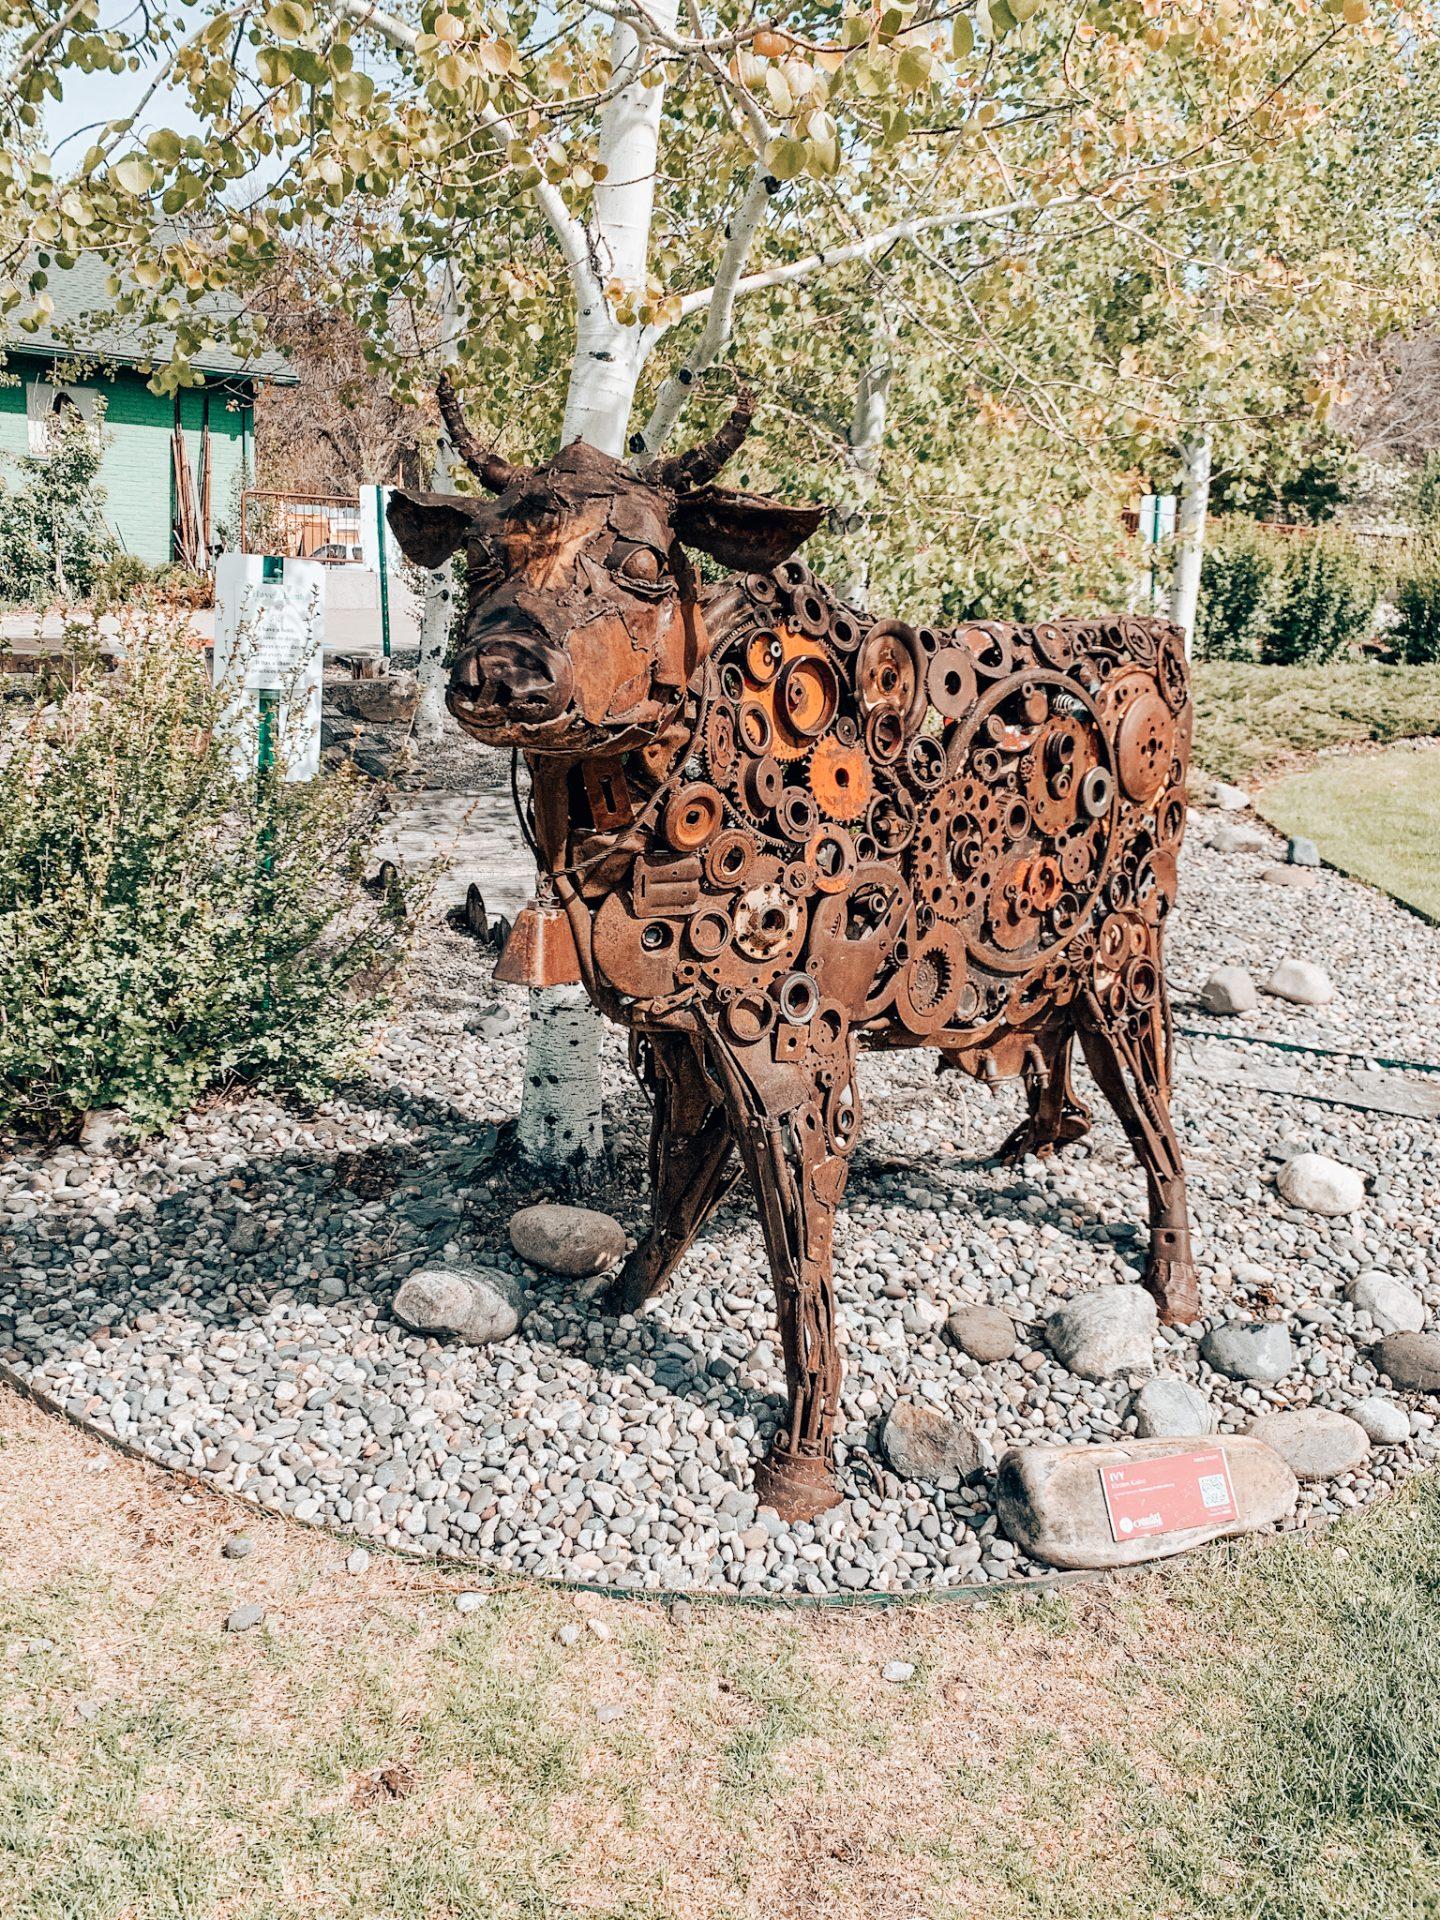 Exploring the sculptures in Bozeman, Montana